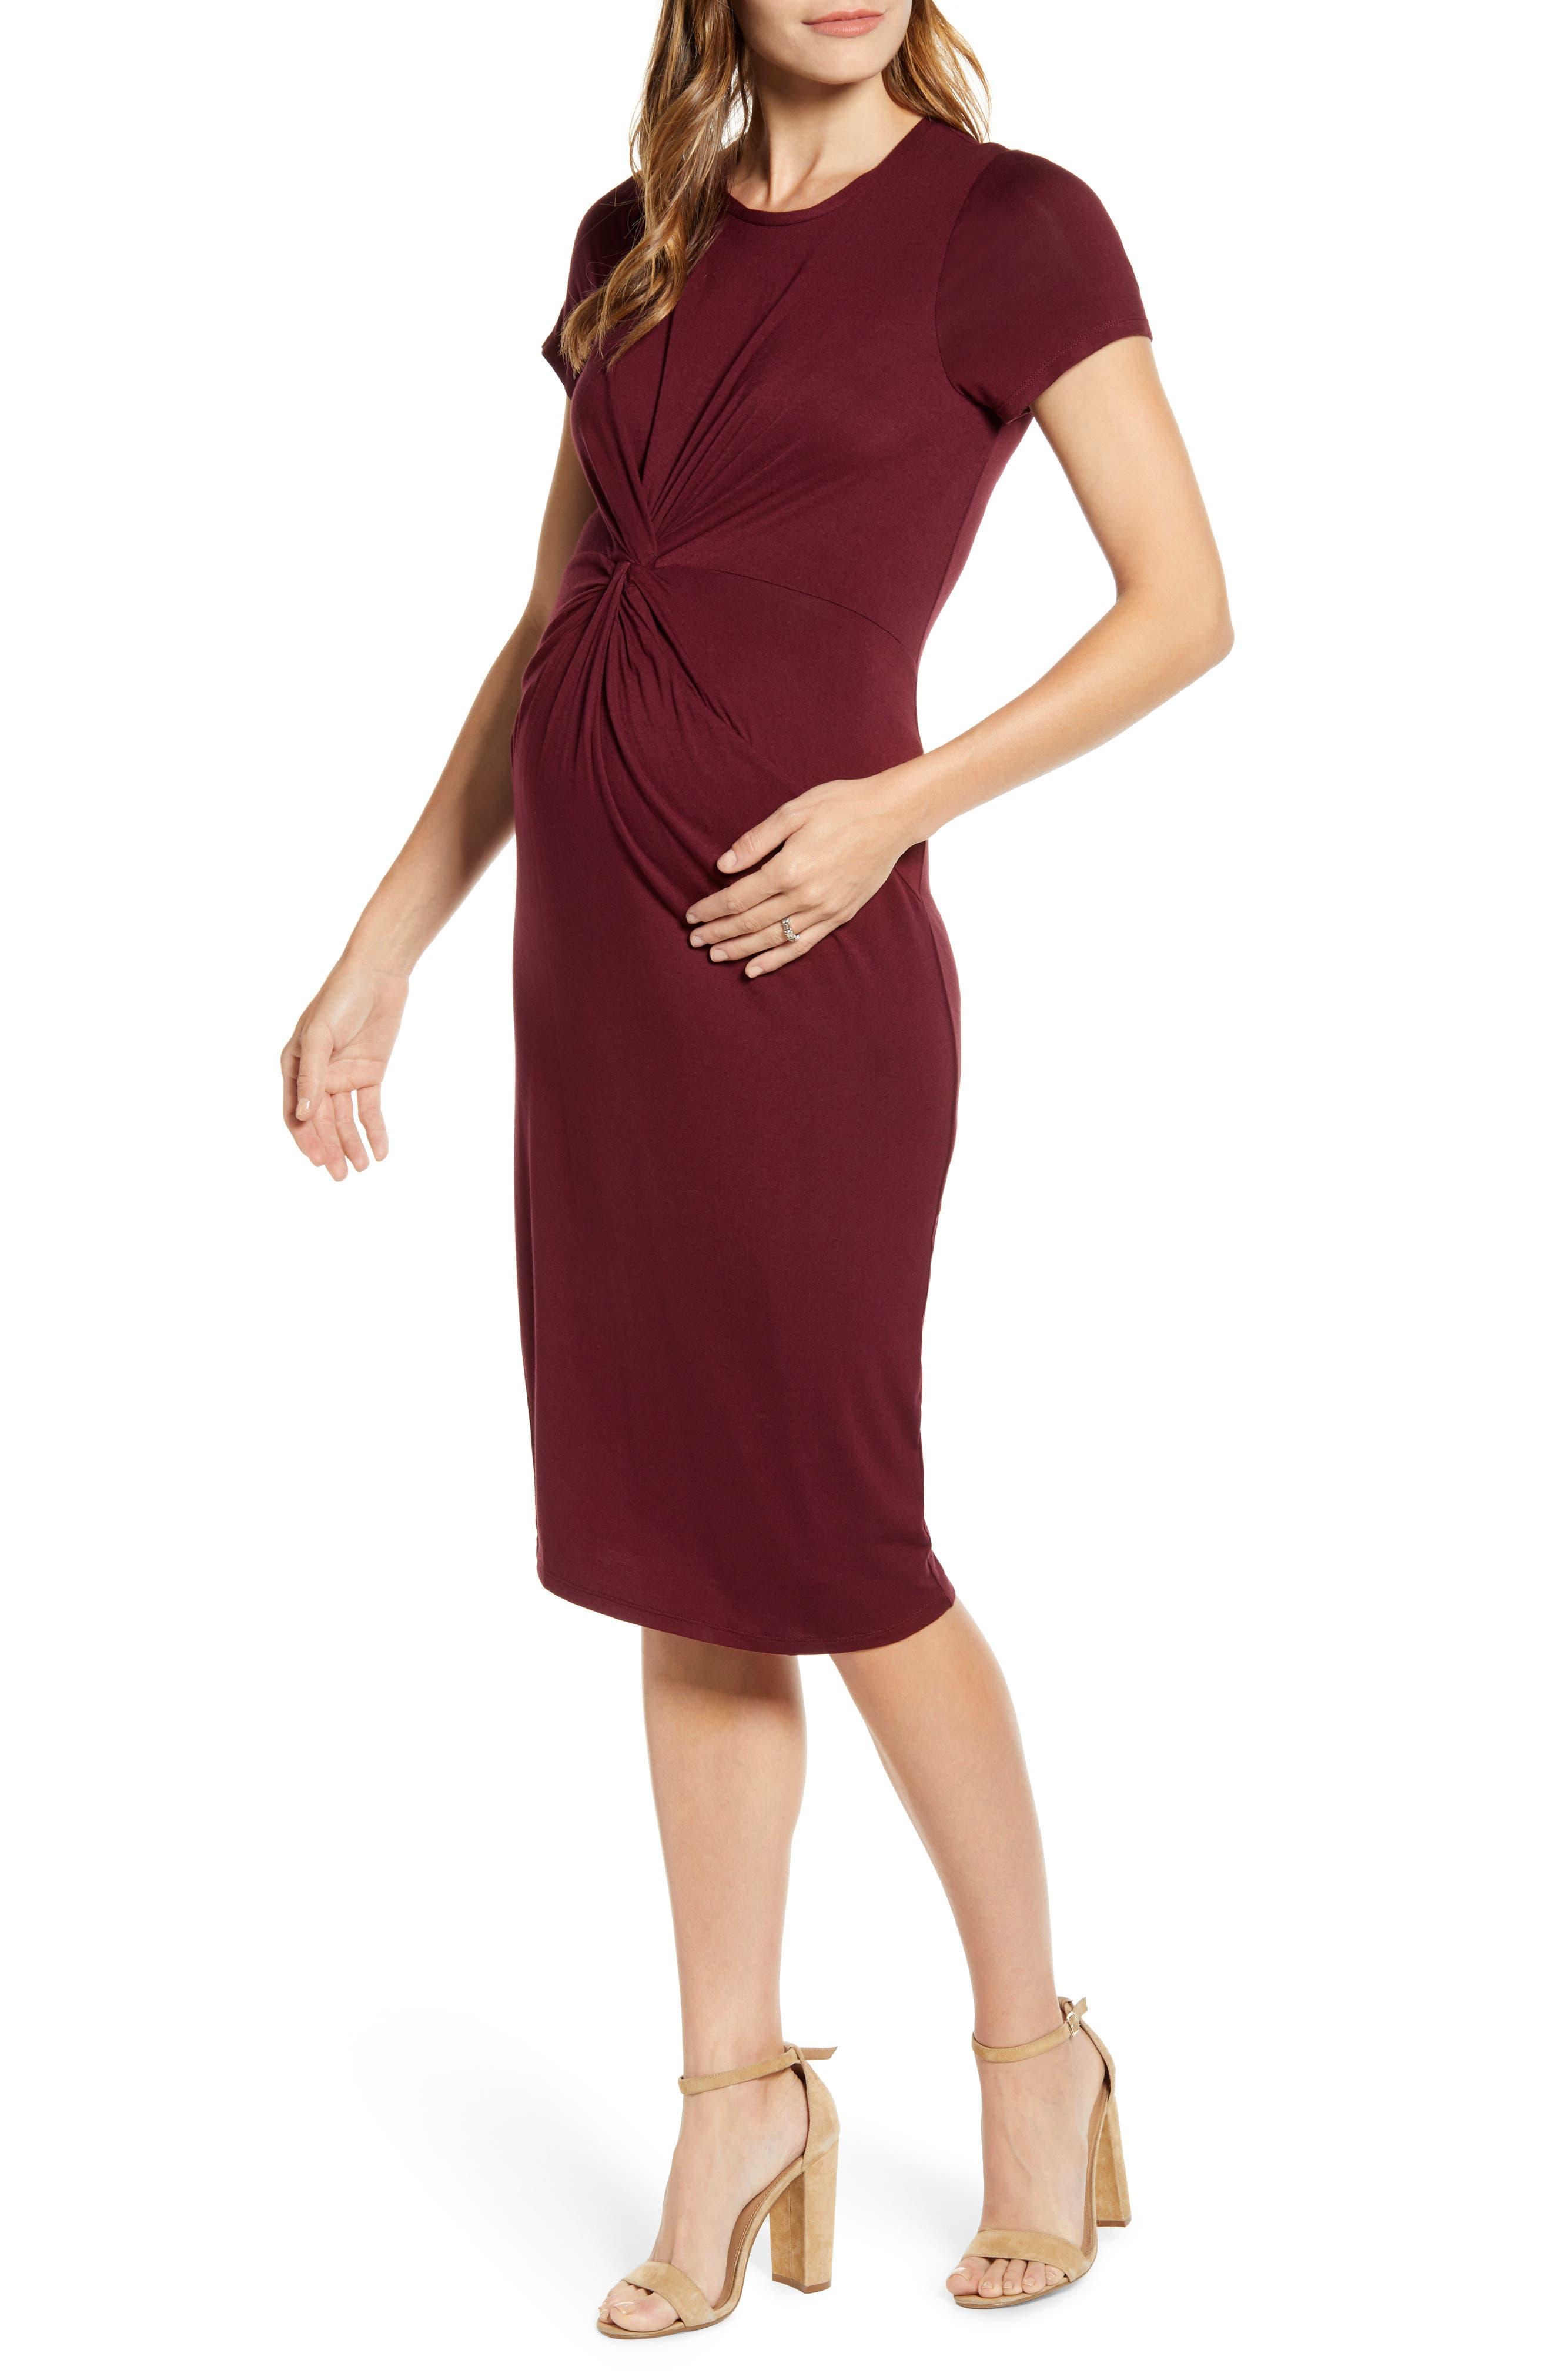 Fourteenth Place Knot Front Maternity Dress, Burgundy